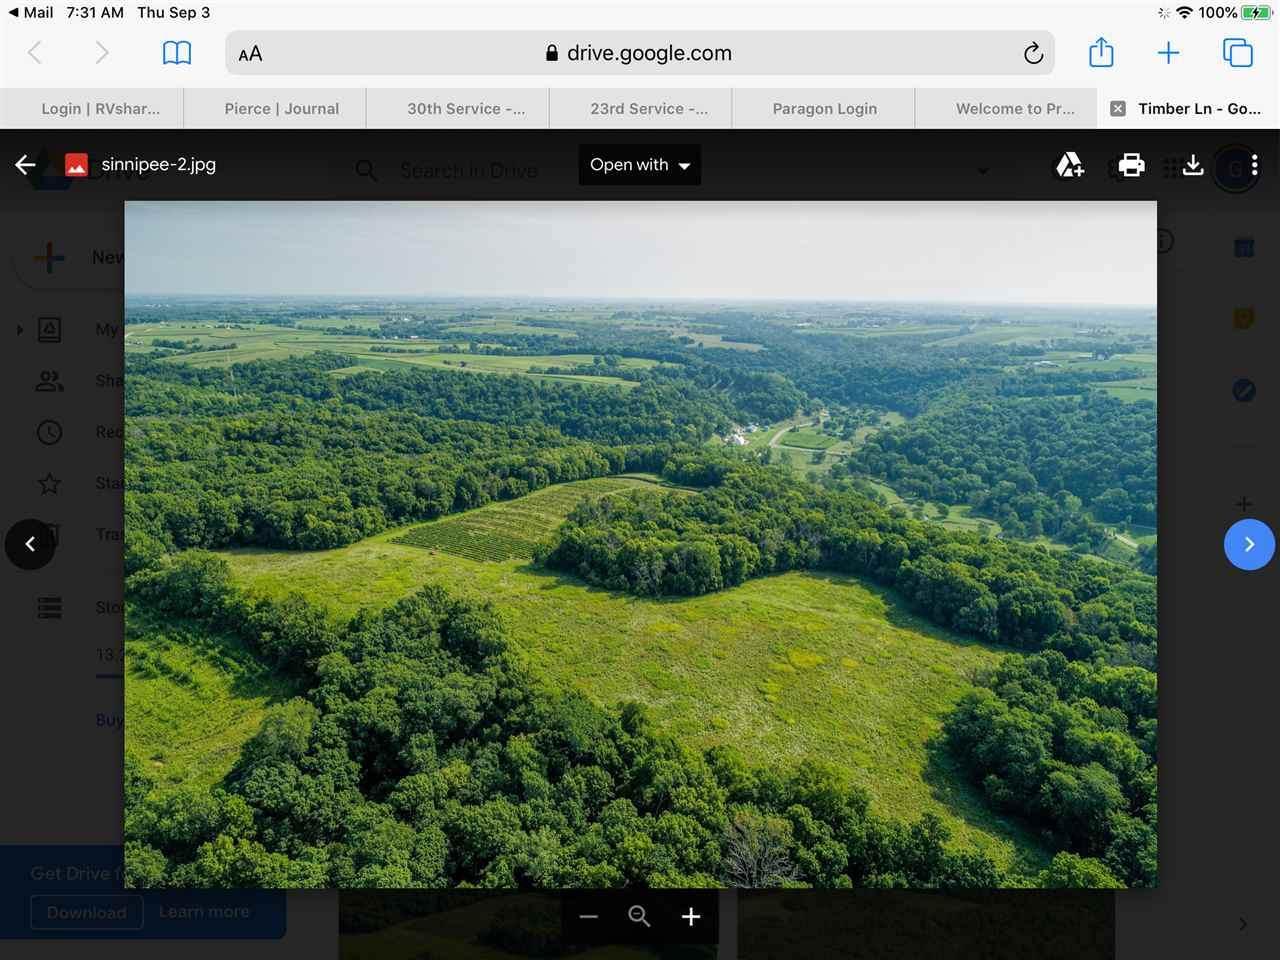 https://bt-photos.global.ssl.fastly.net/madison/orig_boomver_2_1890557-2.jpg